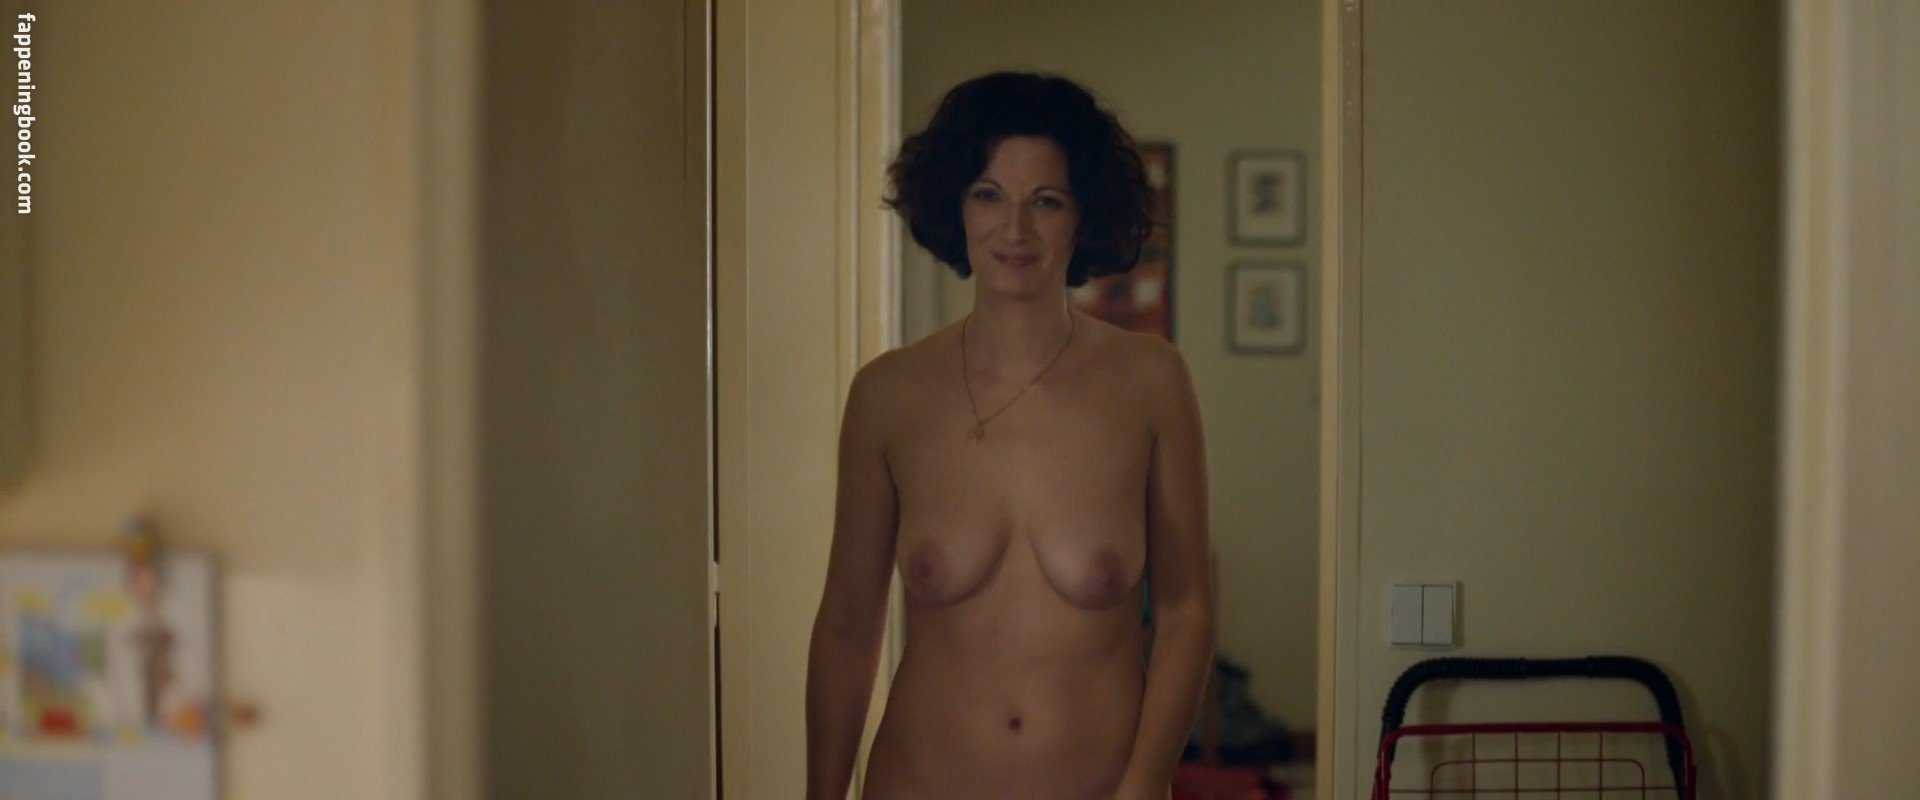 nackt Barros Alejandra Nude celebs,